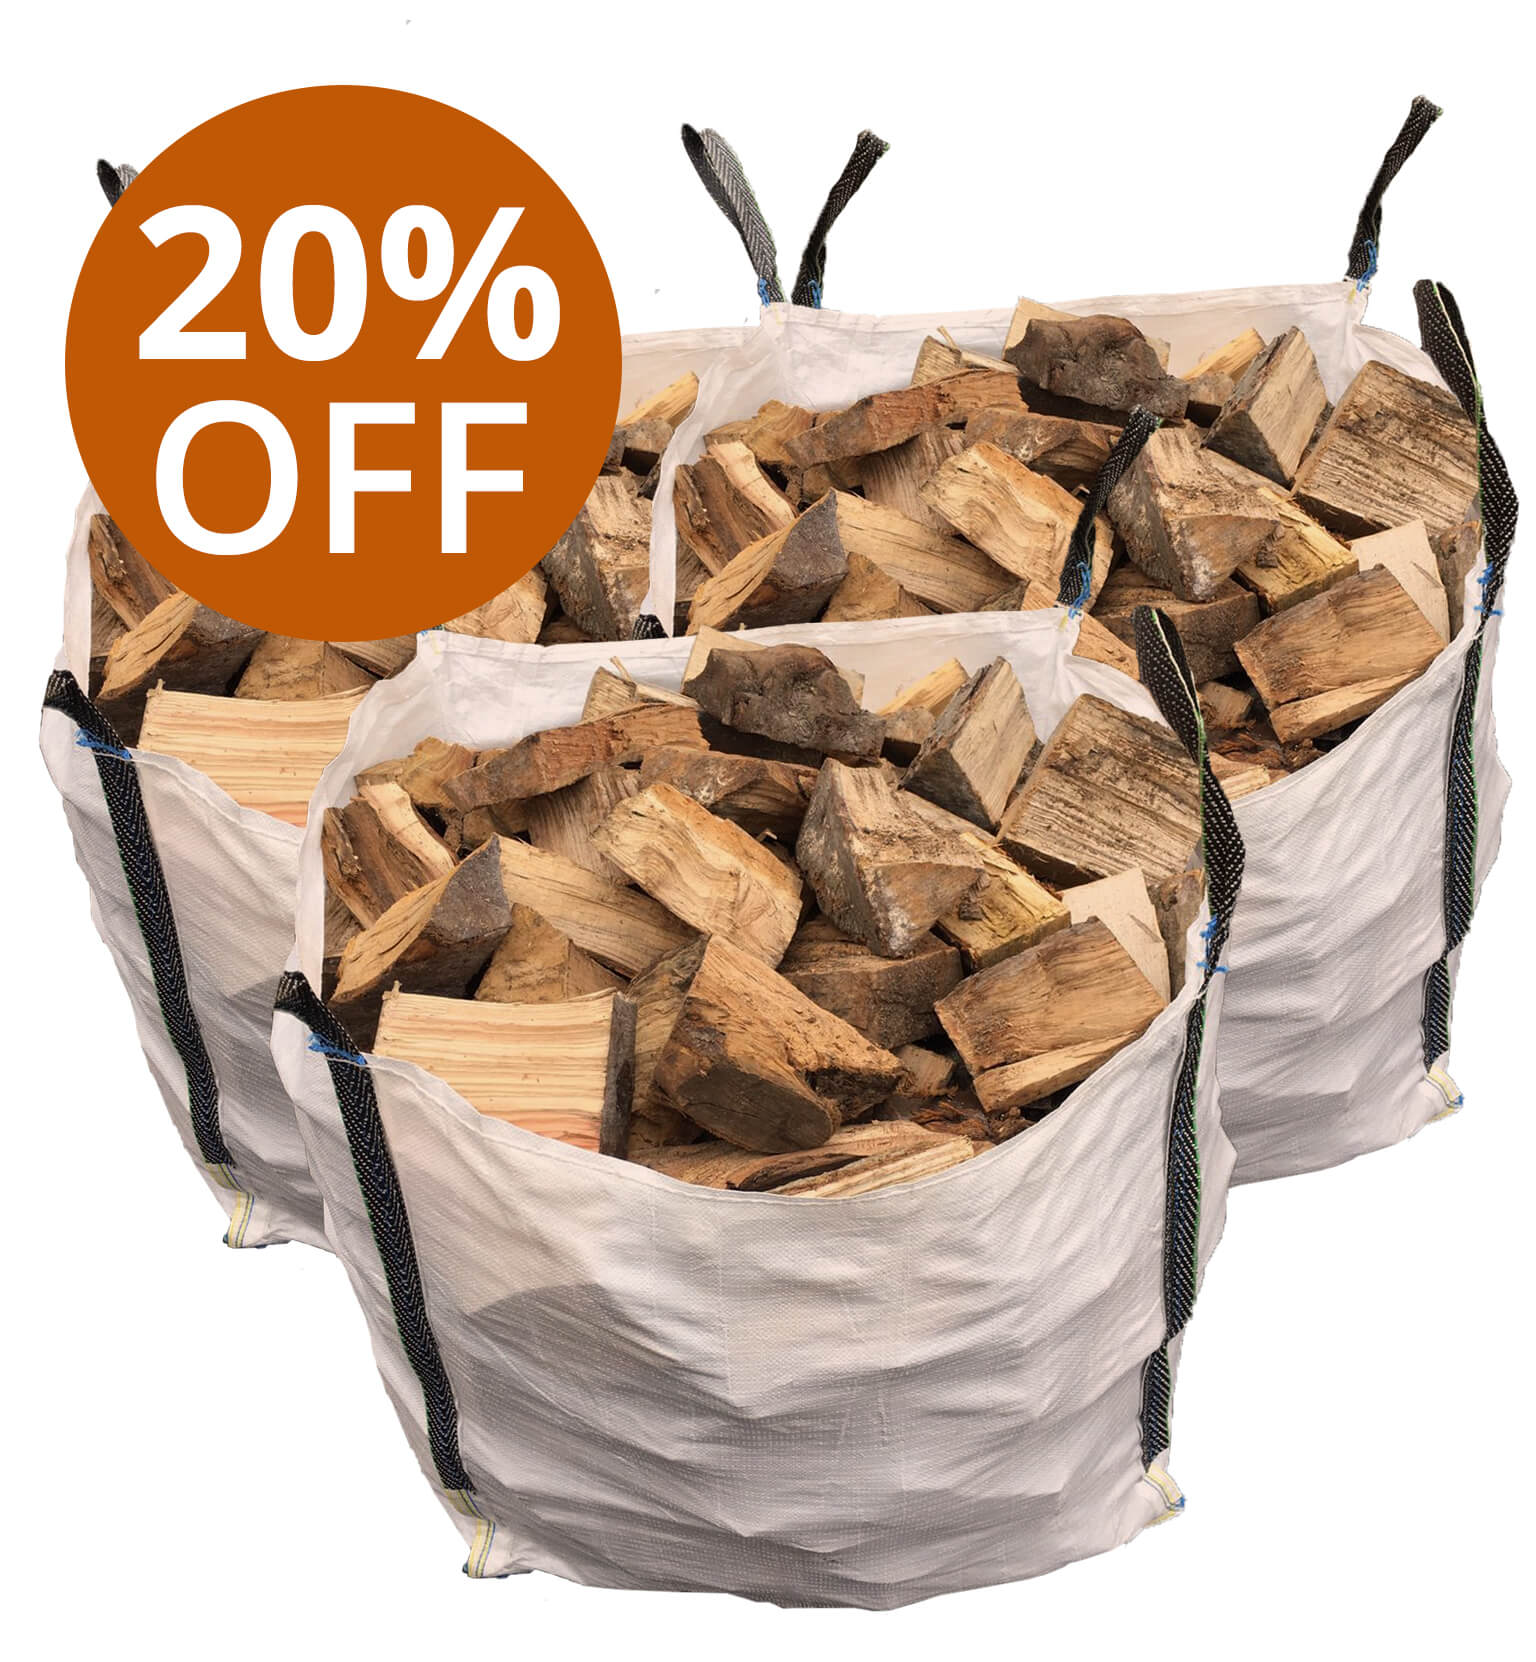 1 Van Load Of Hardwood Logs Leeds